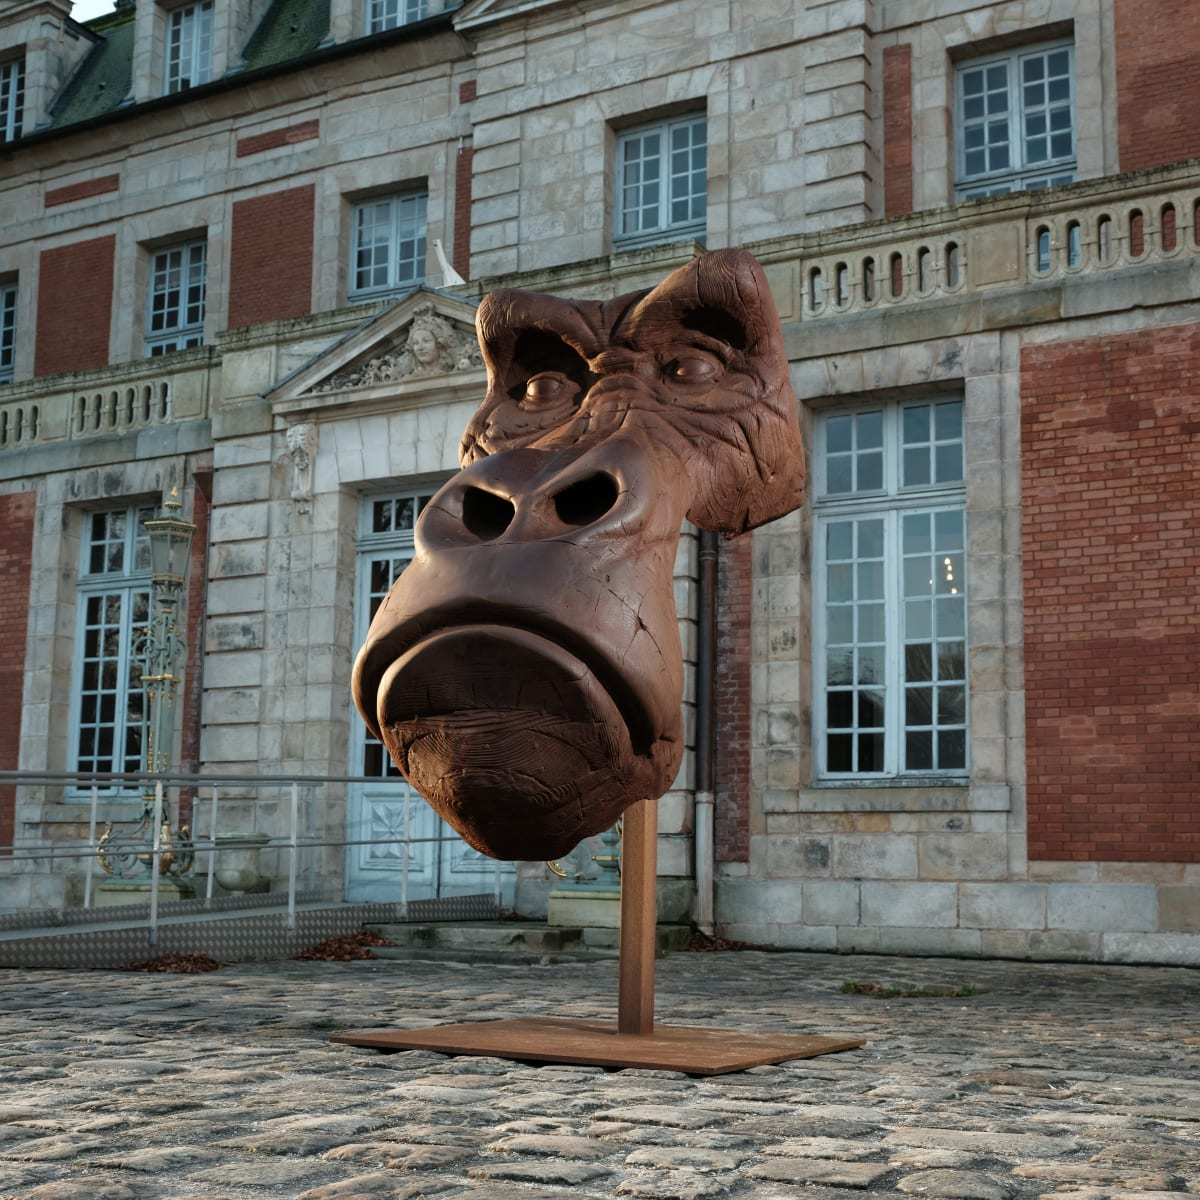 Quentin Garel at the Domaine de Chamarande: Anomal